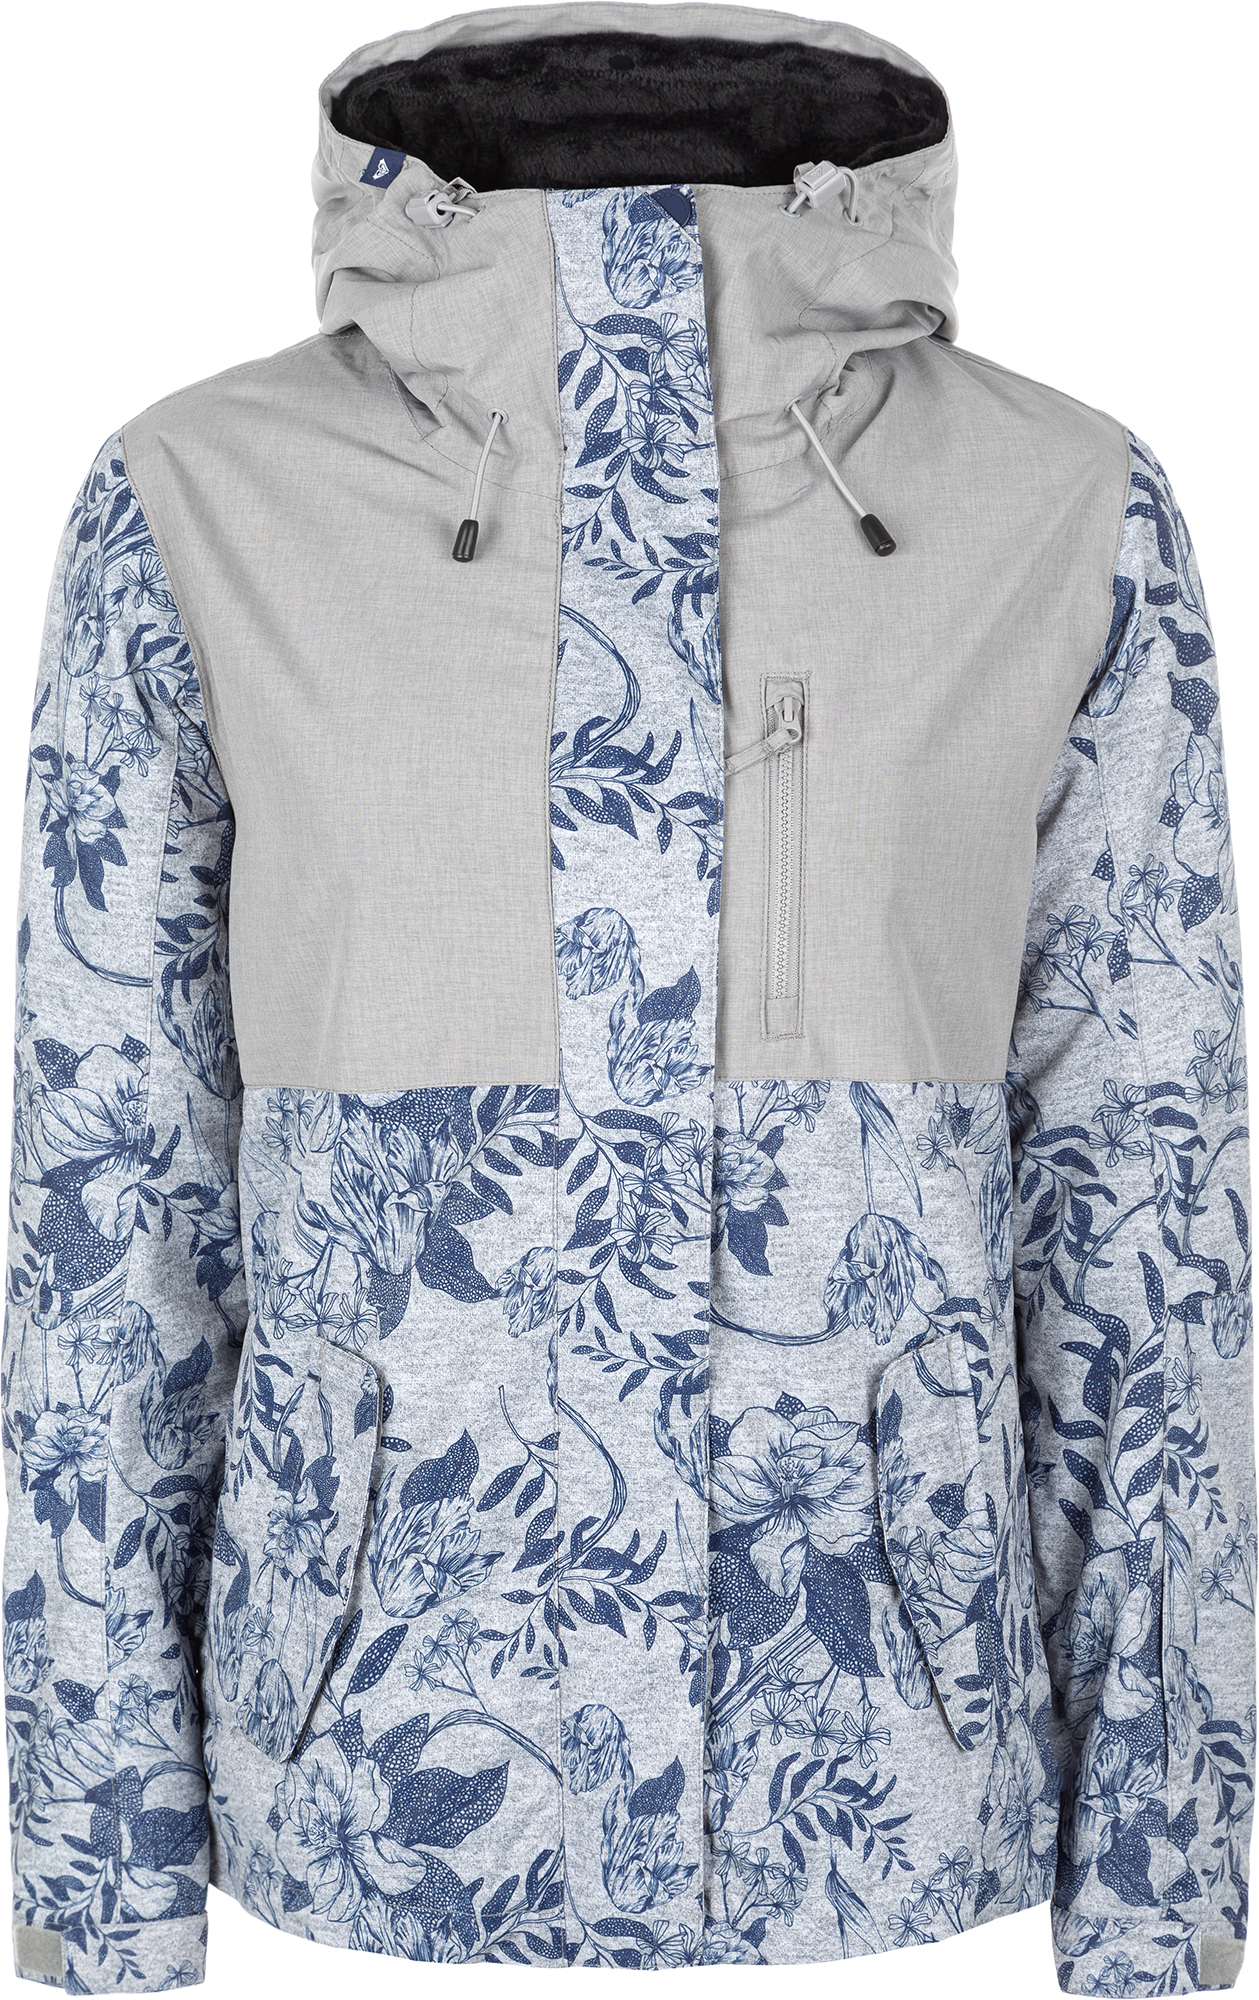 цена на Roxy Куртка женская Roxy Jetty 3 IN 1 JK, размер 42-44